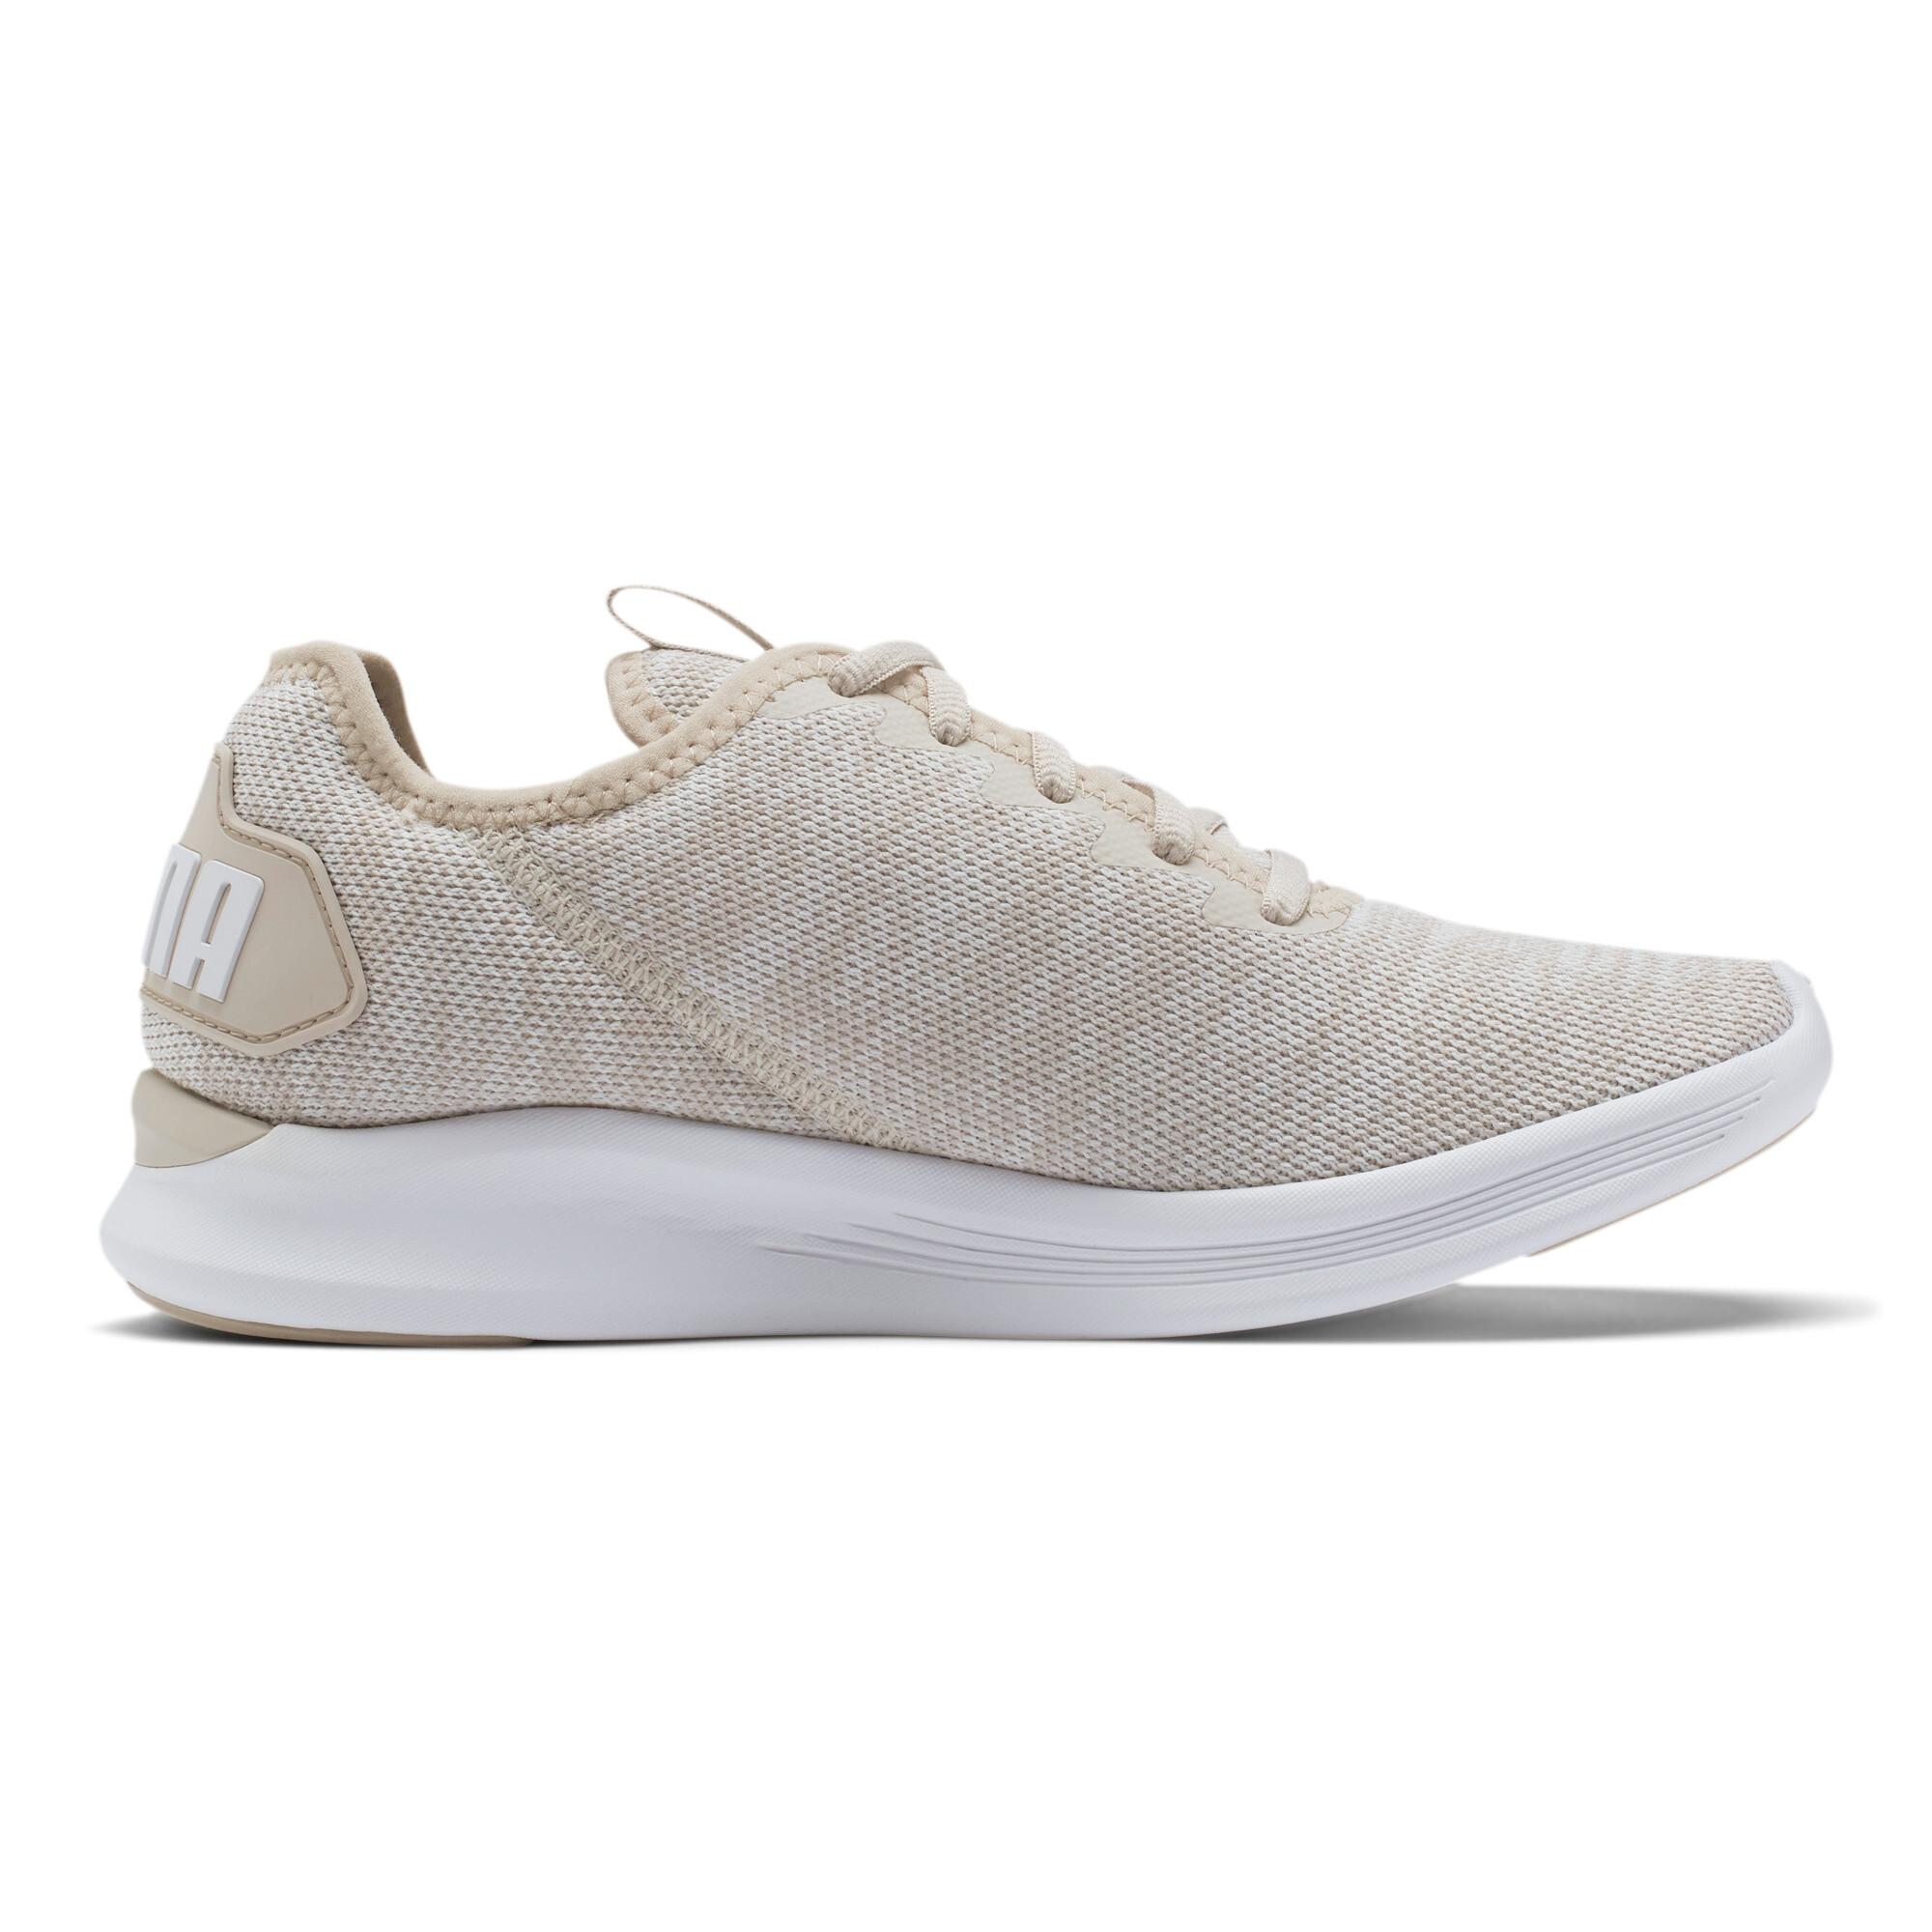 PUMA-Ballast-Women-039-s-Running-Shoes-Women-Shoe-Running thumbnail 26